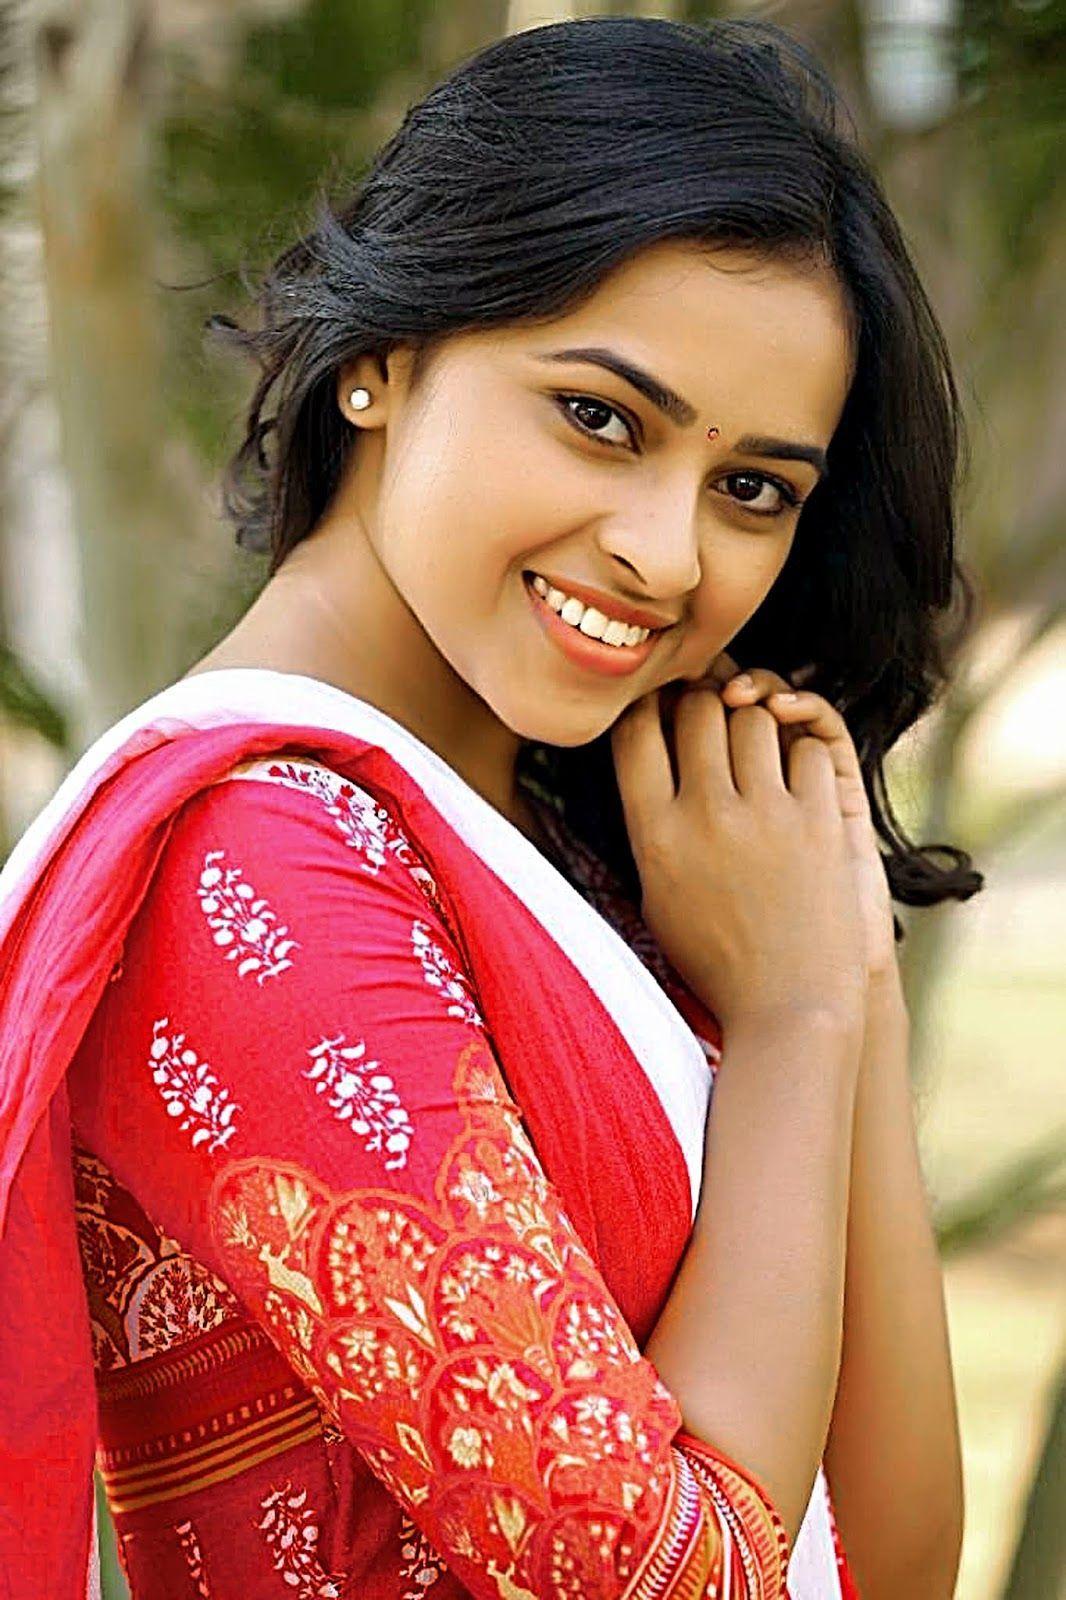 [50+] Tamil Actress HD Wallpapers on WallpaperSafari